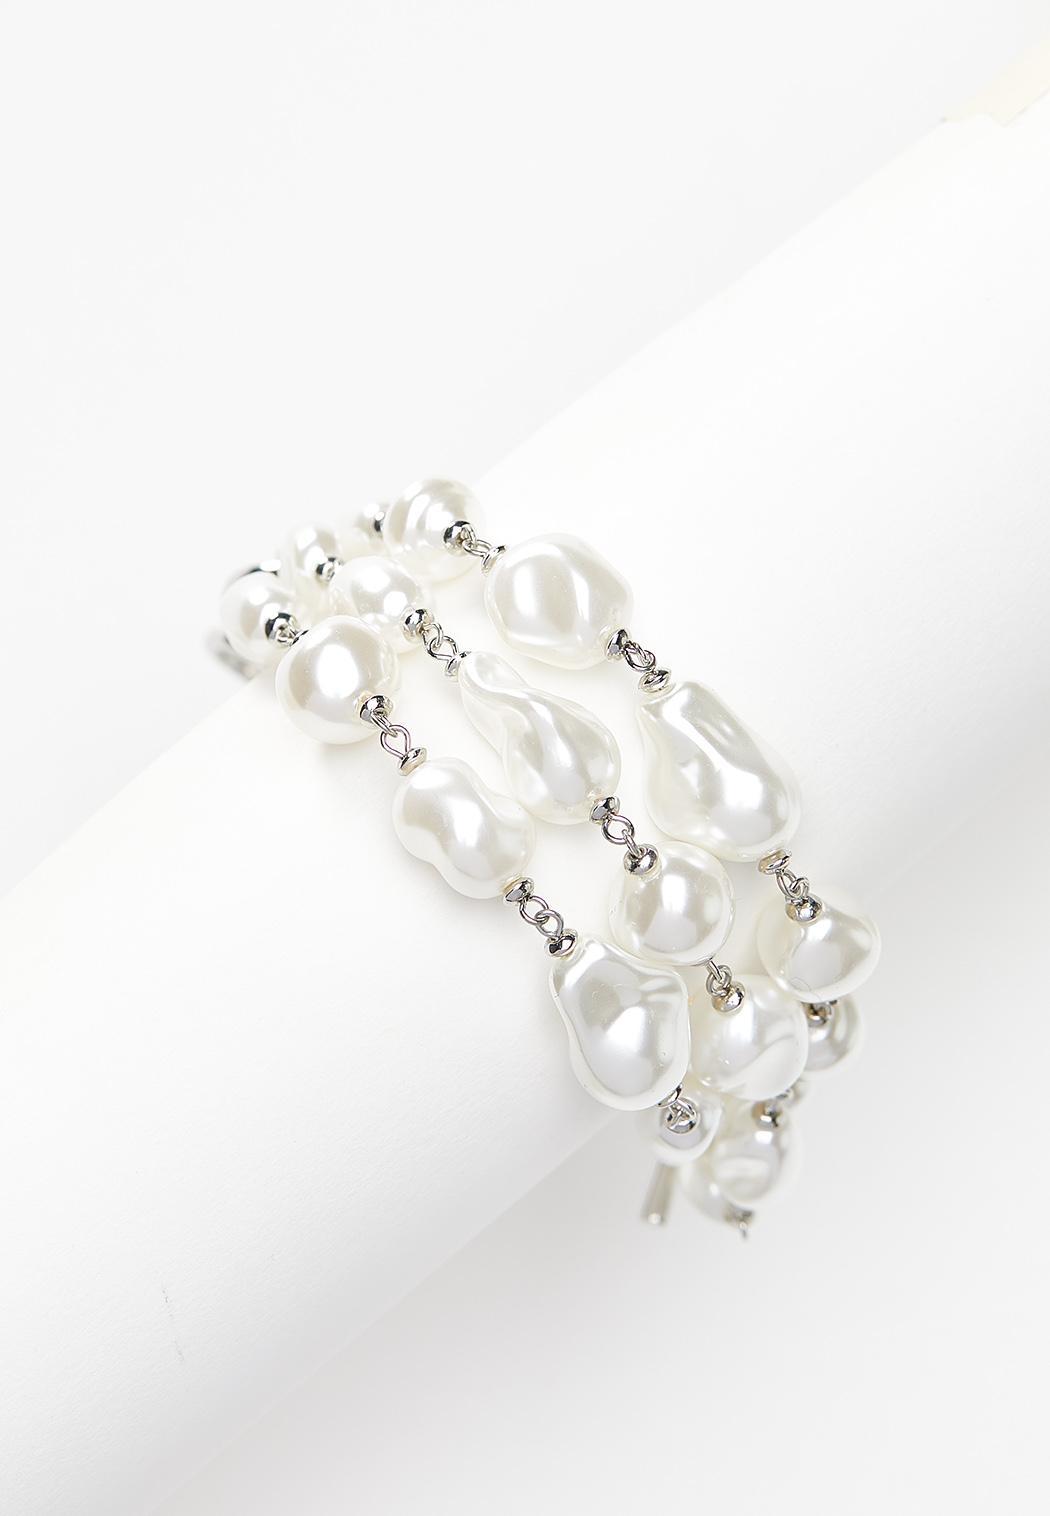 Freshwater Pearl Toggle Bracelet Set